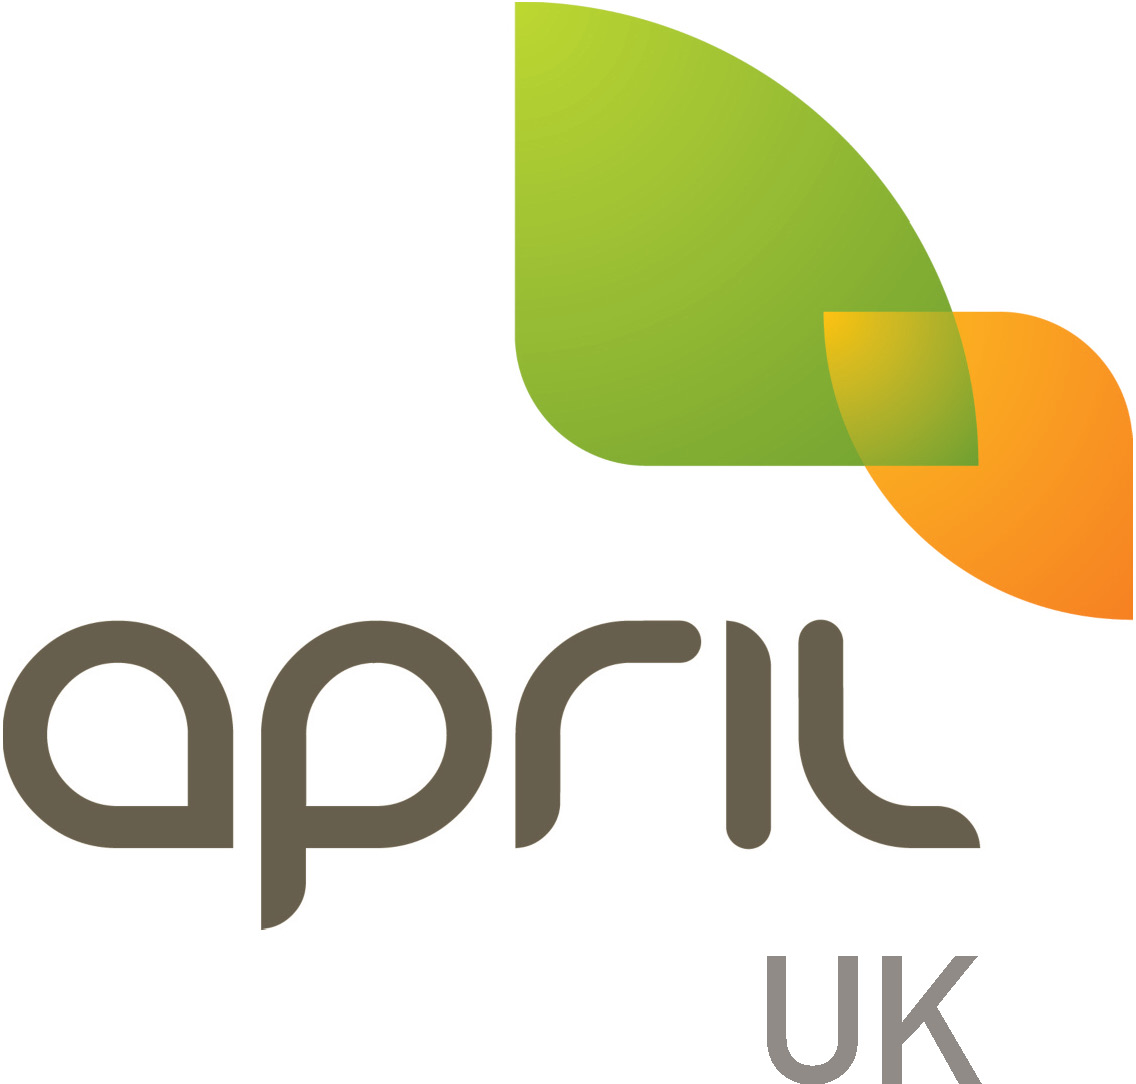 April UK - www.april-uk.com